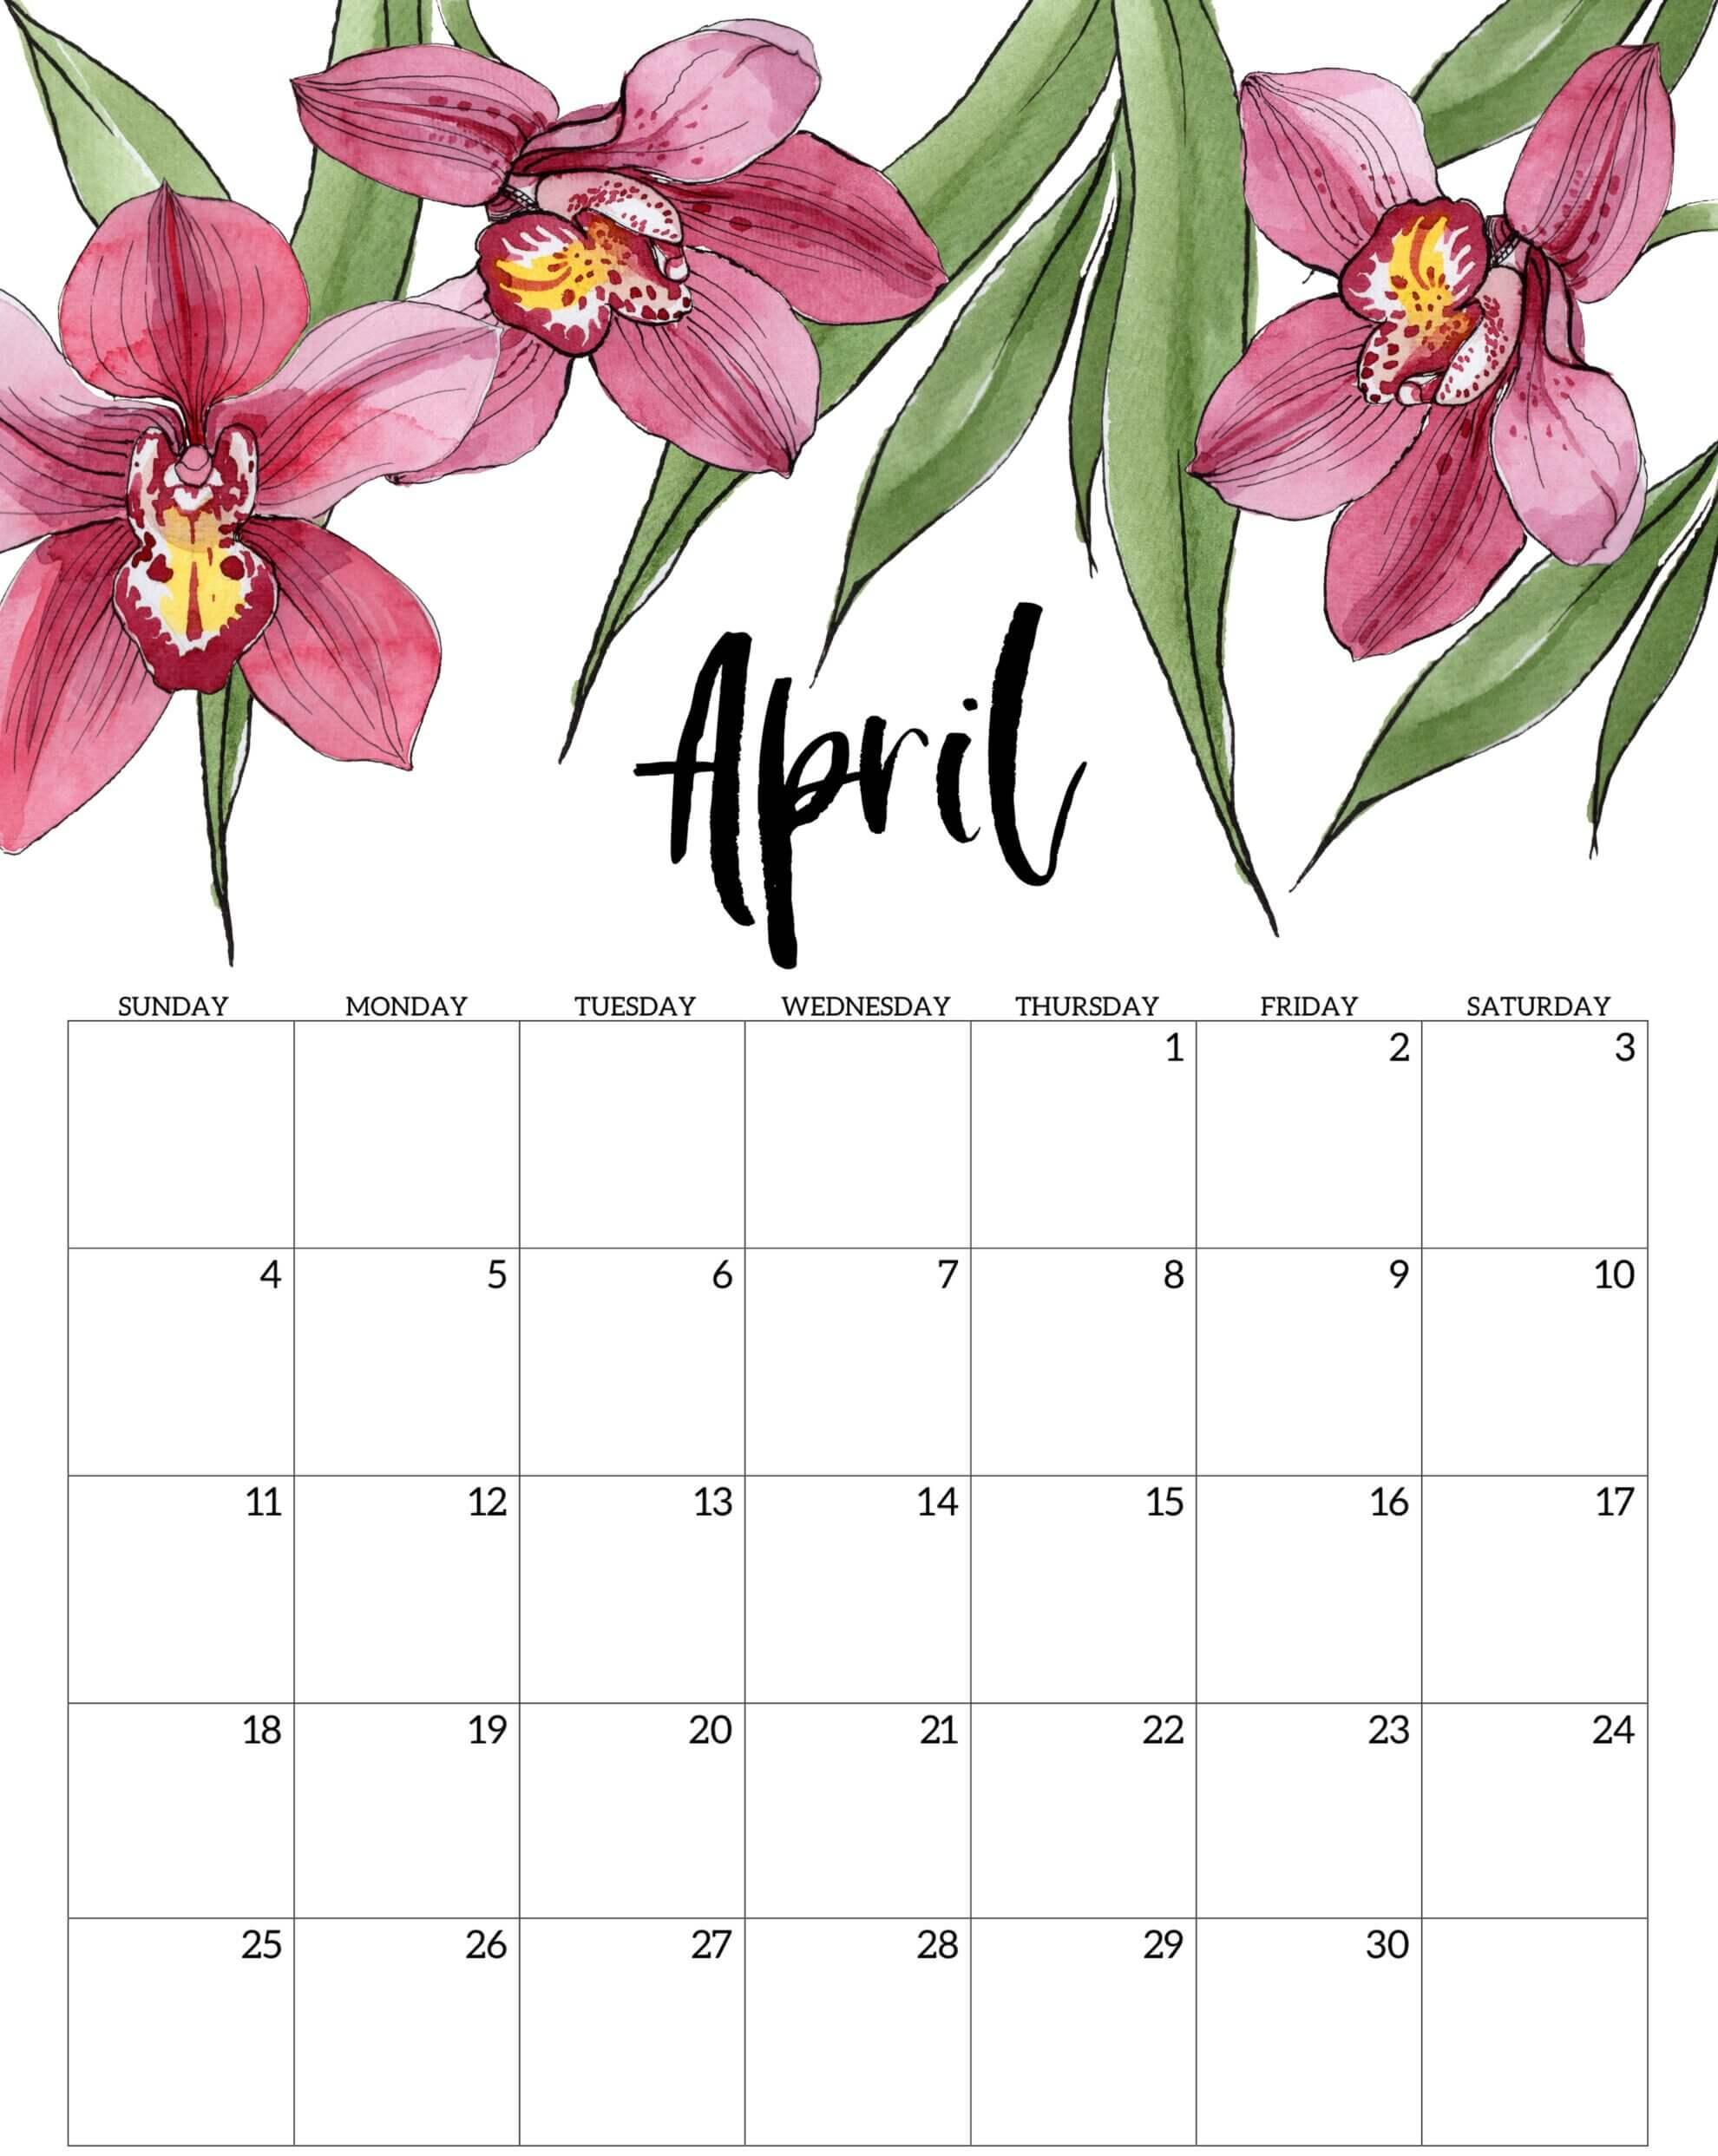 April 2021 Floral Calendar